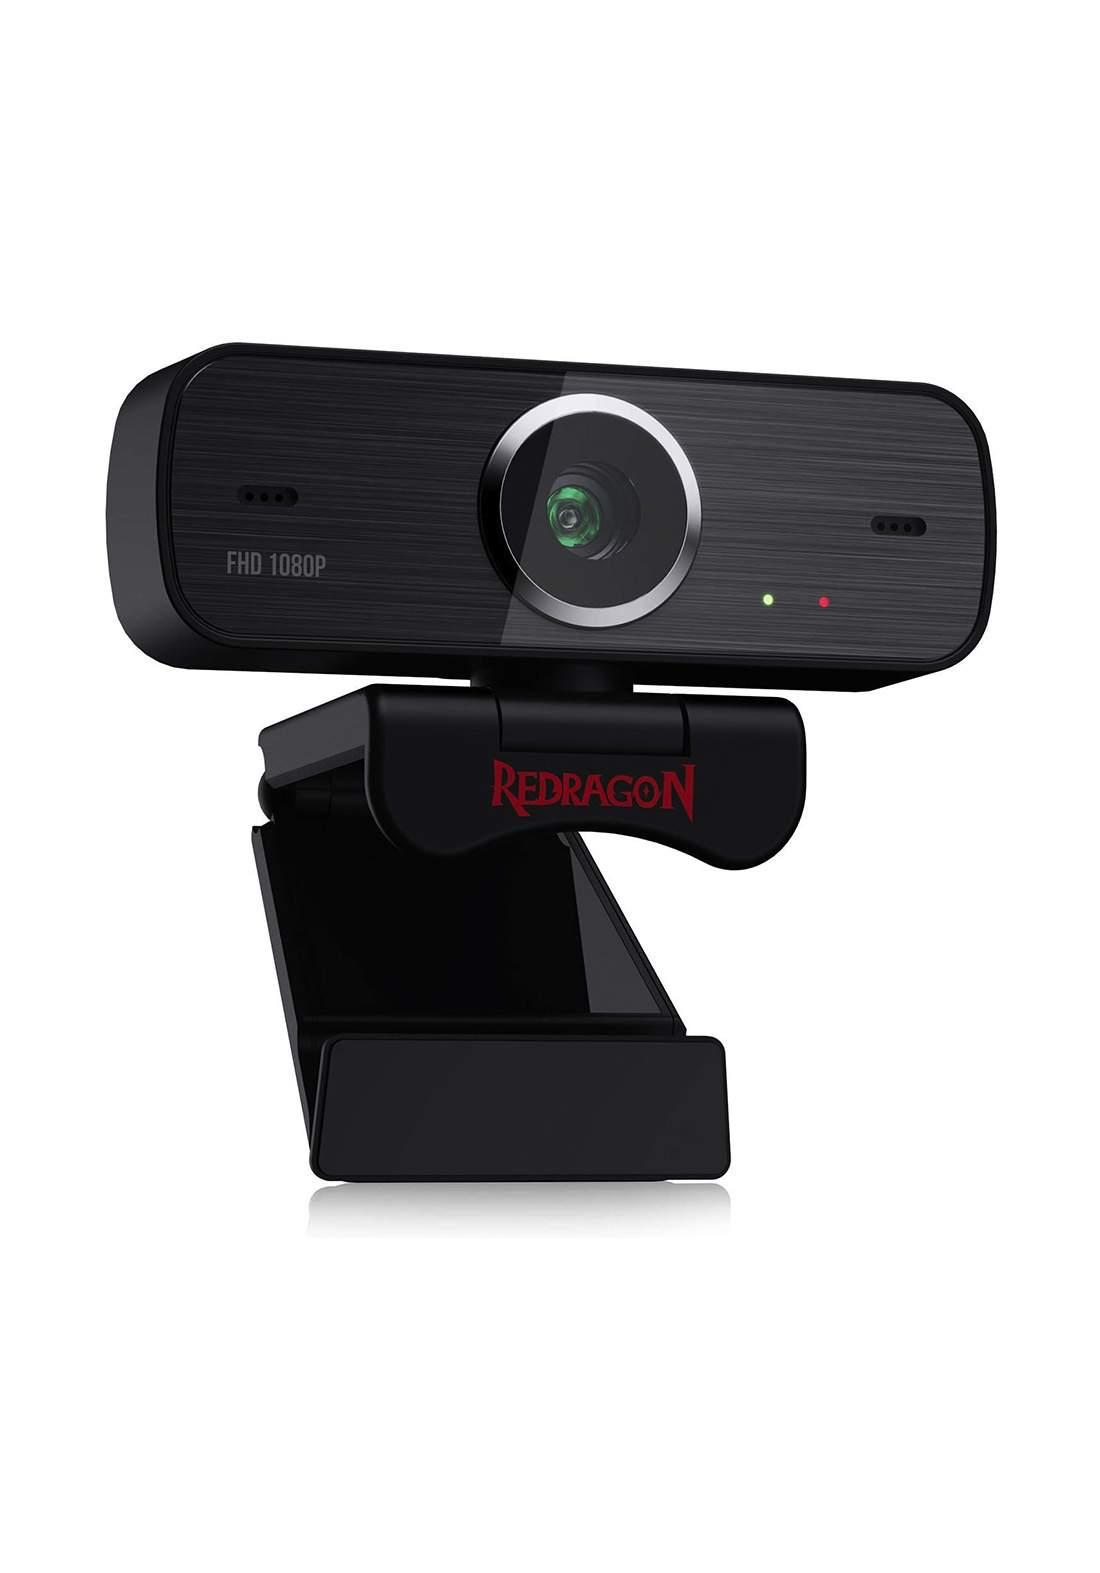 Redragon GW800 Hitman 1080P 30fps Max stream webcam - Black  كاميرا